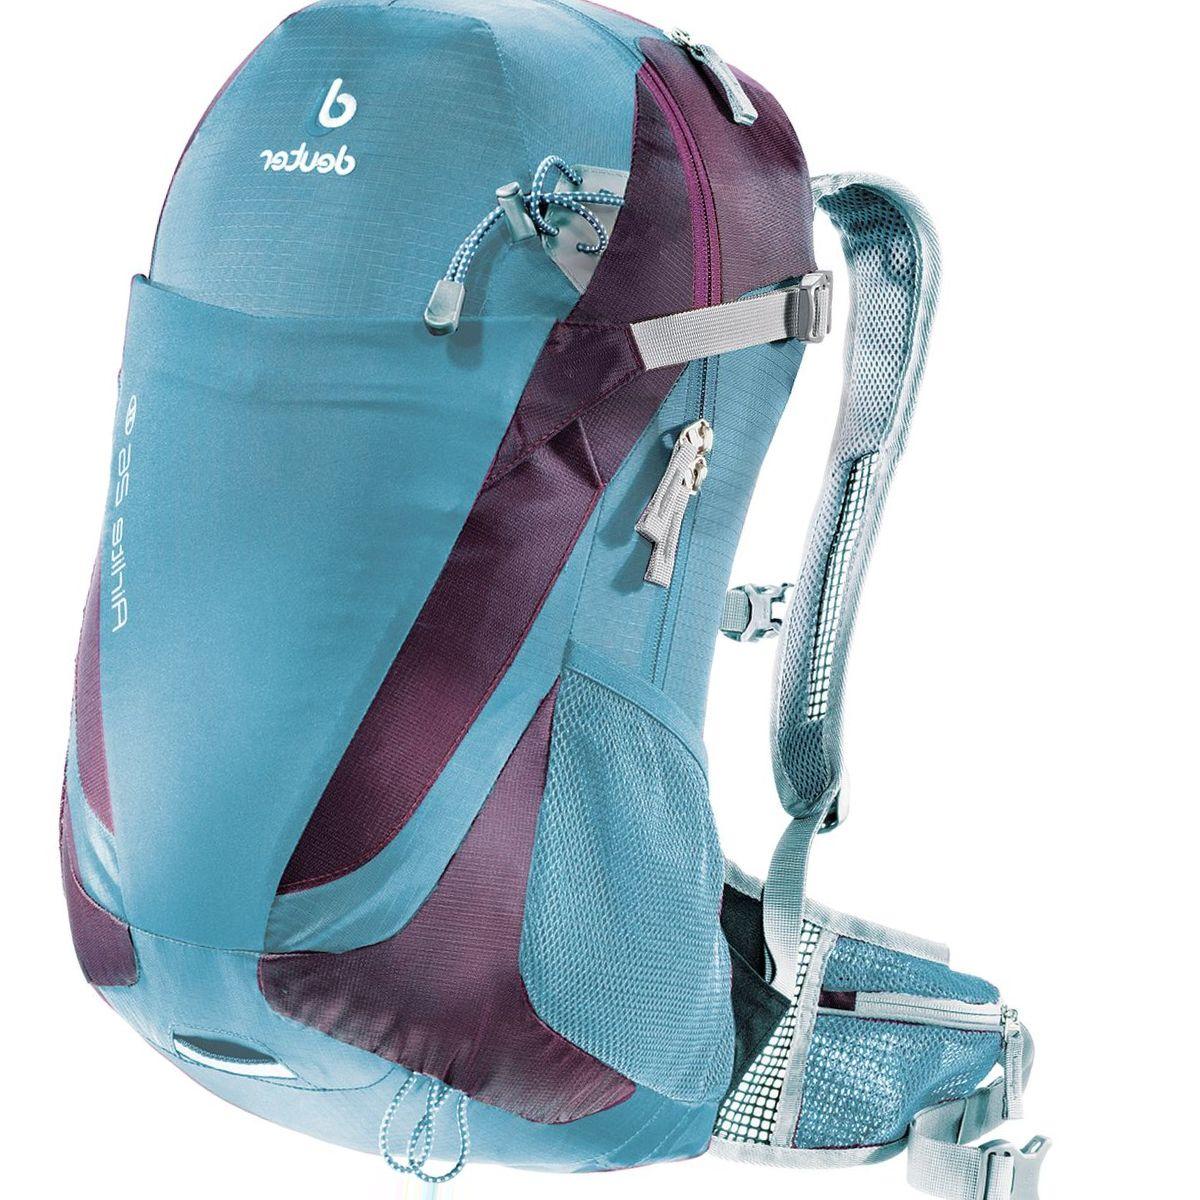 Deuter Airlite SL 26L Backpack - Women's